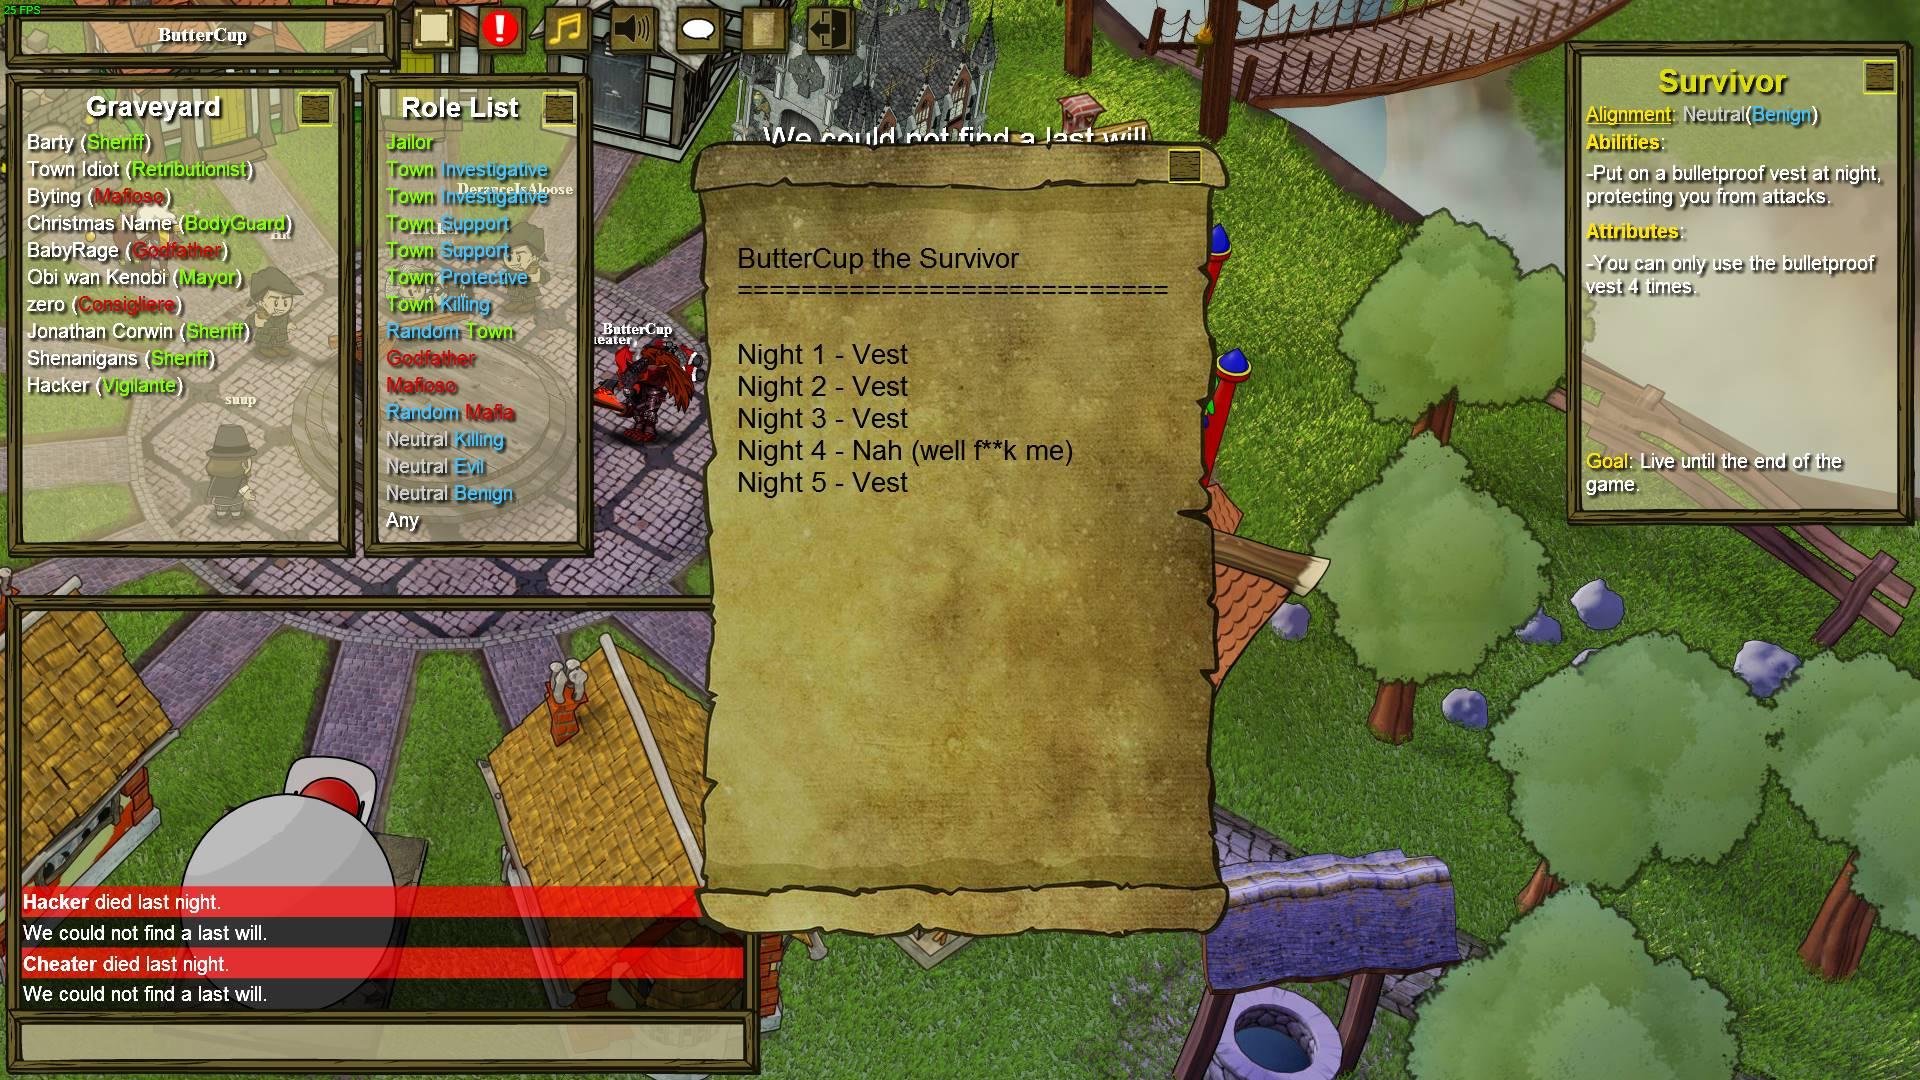 Steam közösség :: Útmutató :: Will Guide for Each Specific Town Role